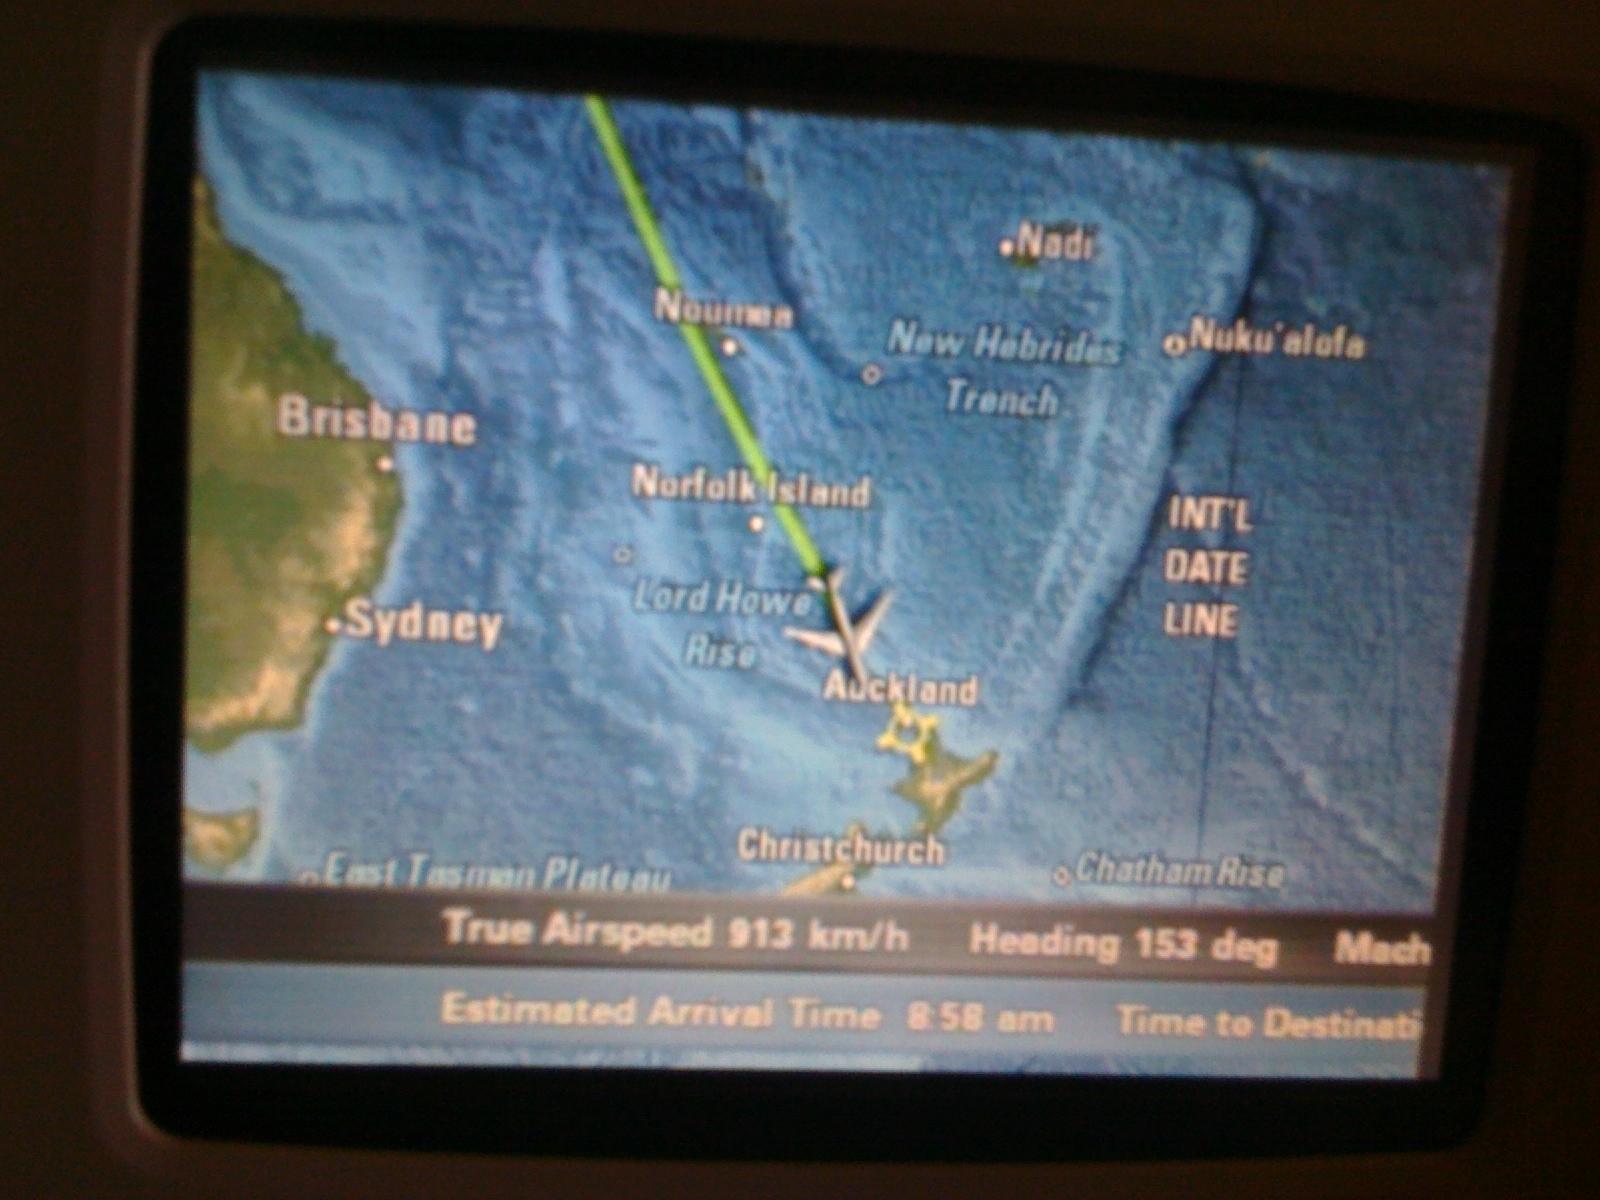 Arriving Auckland